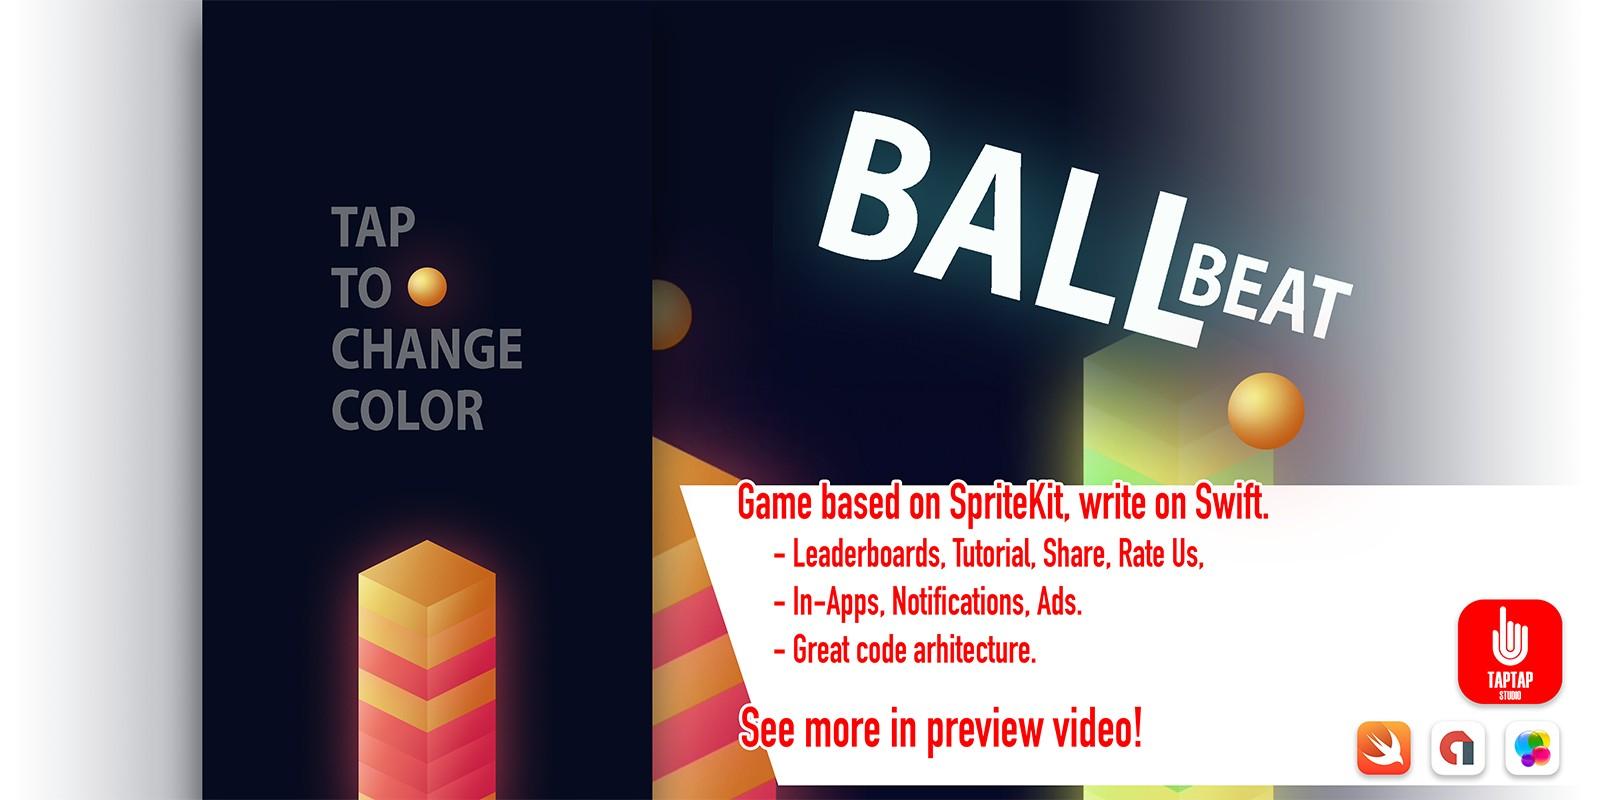 Ball Beat - iOS Source Code